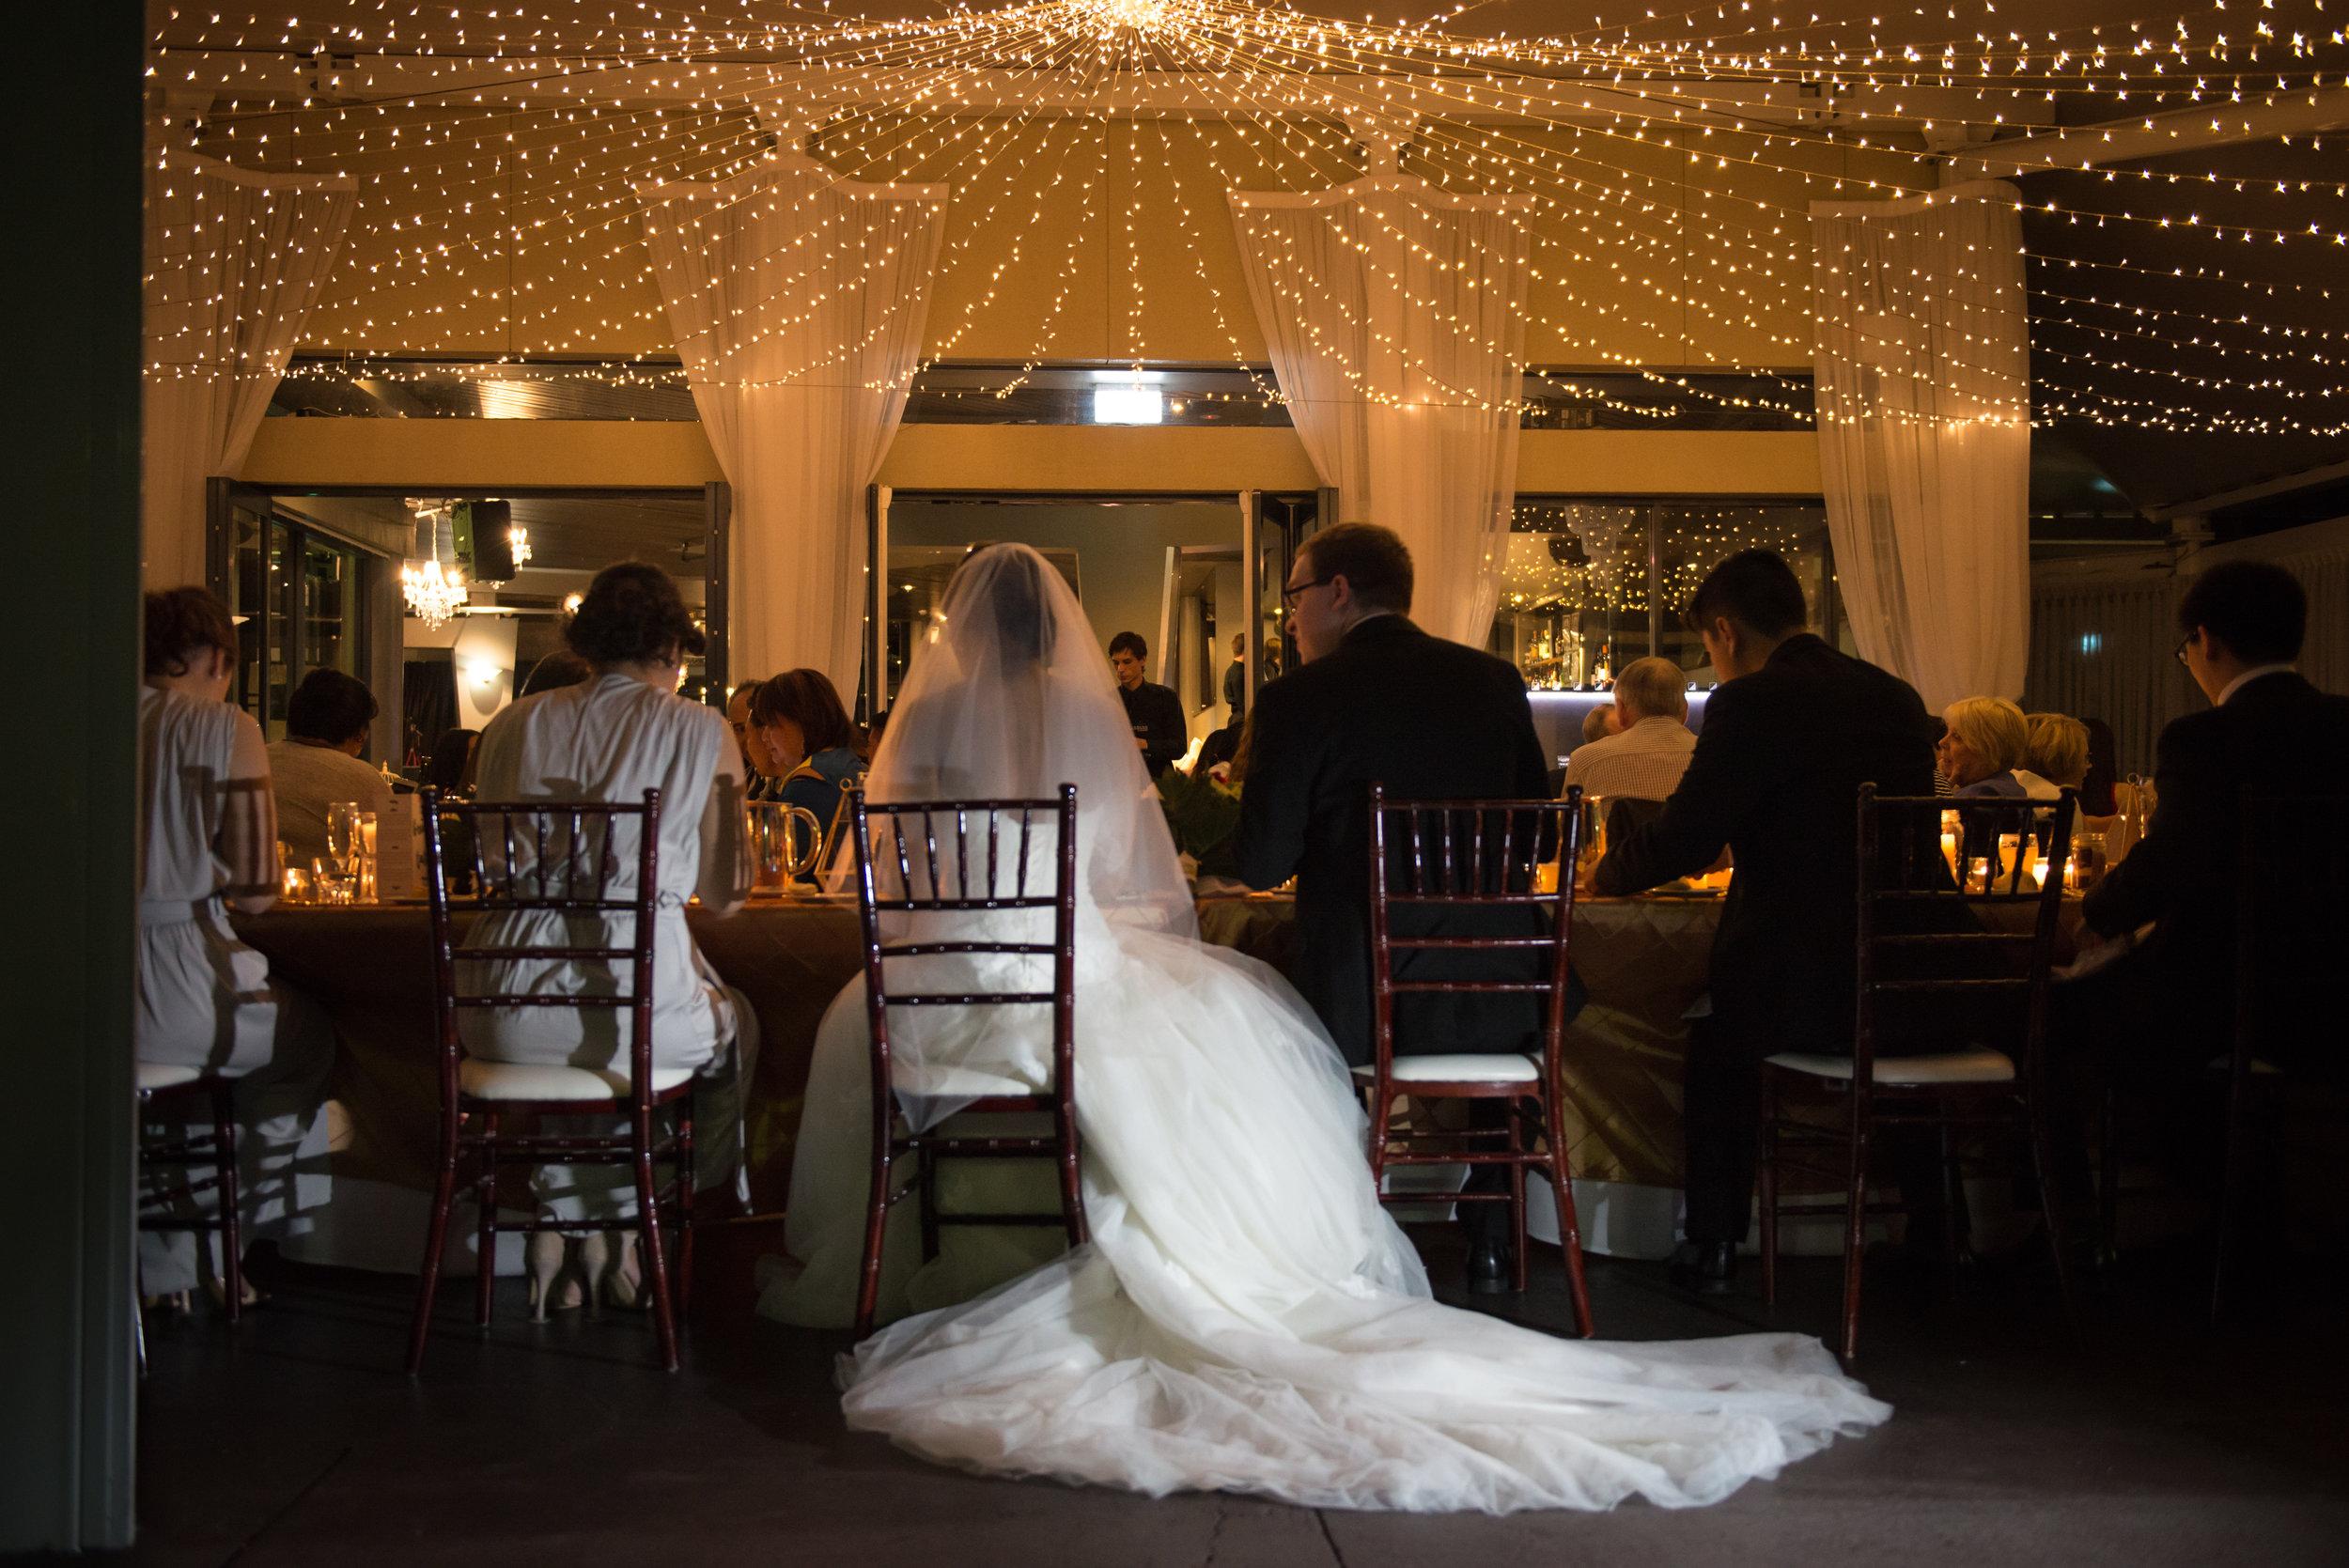 Rohan James Photography - Sophia & Dan Wedding Reception-15.jpg